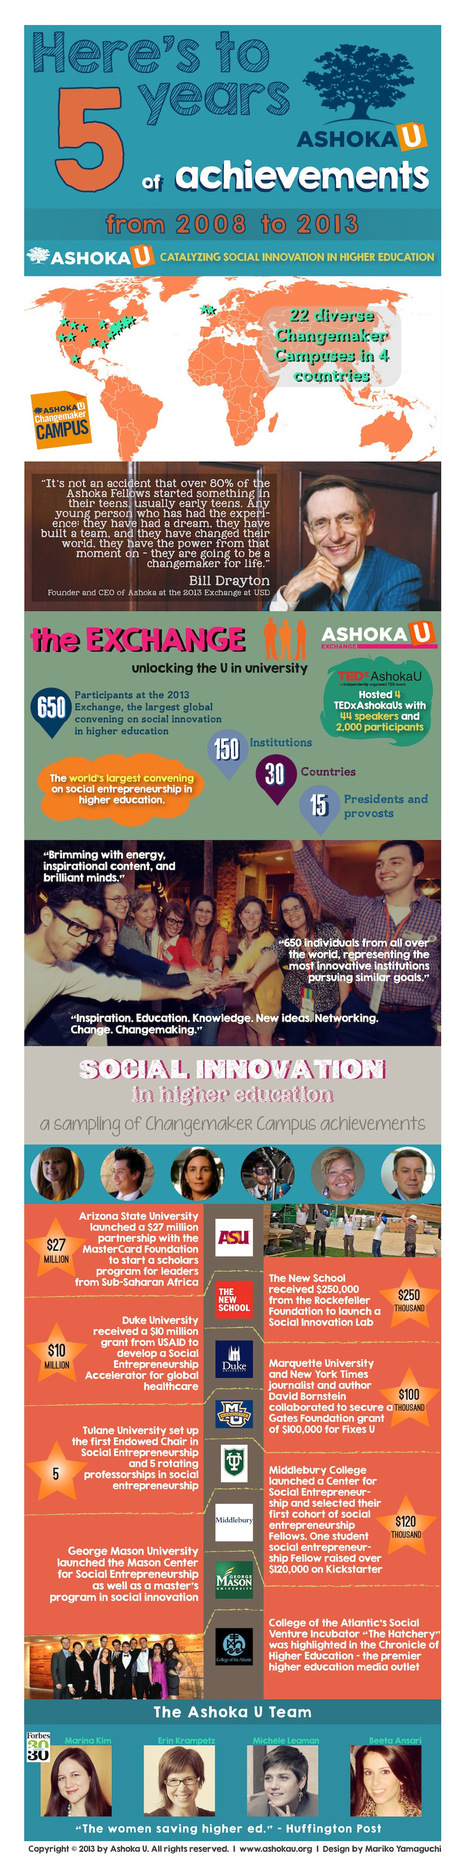 Ashoka U: Celebrating 5 years of Achievements! | Evidence-based Practices in STEM Education | Scoop.it